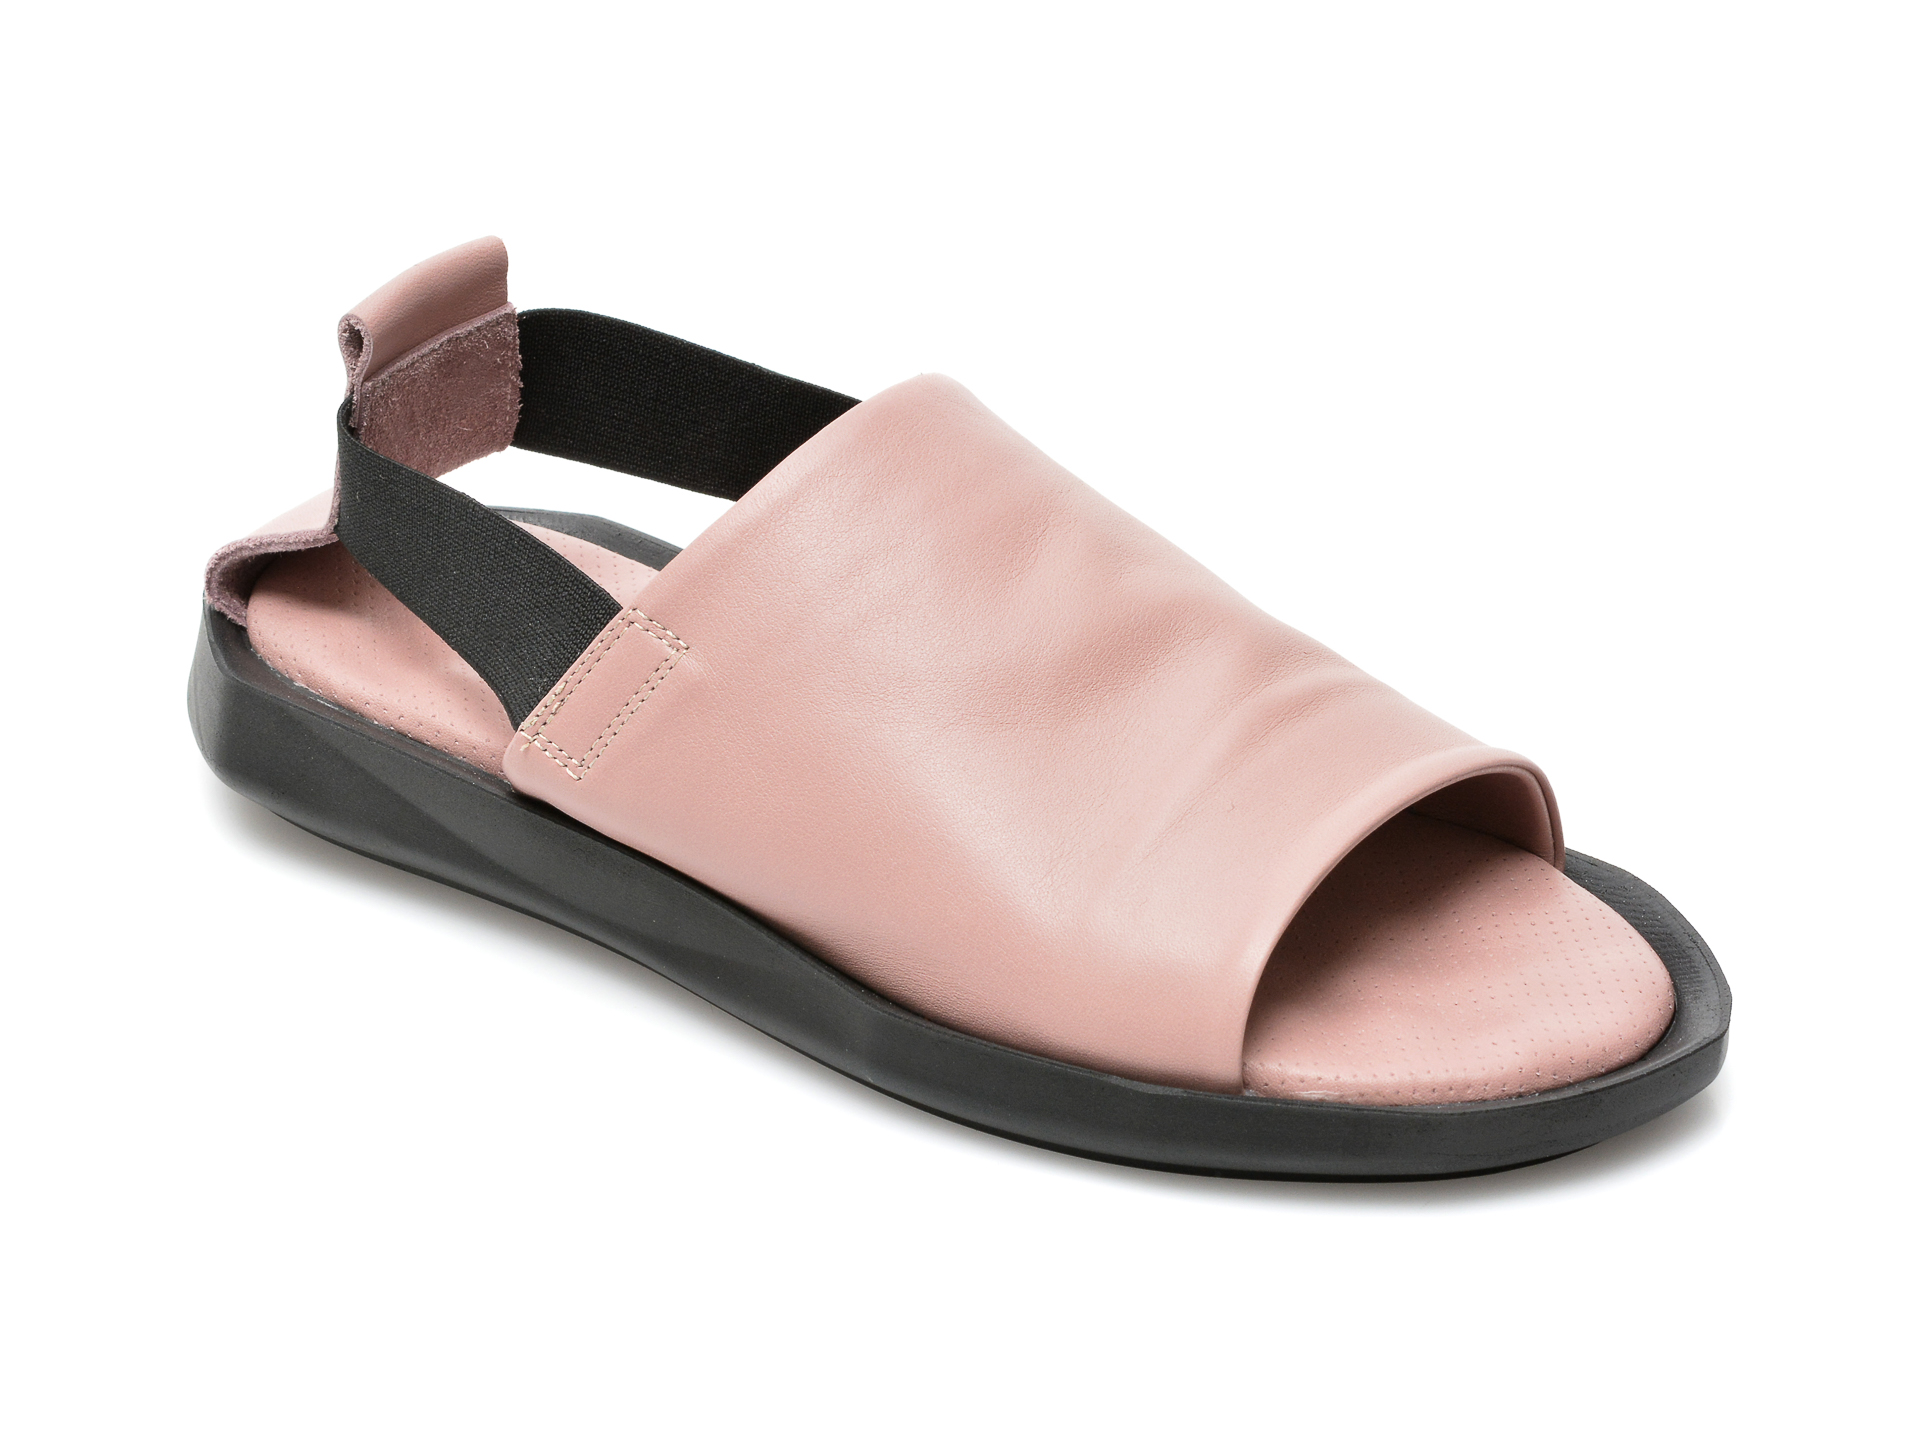 Sandale FLAVIA PASSINI roz, 42641, din piele naturala imagine otter.ro 2021